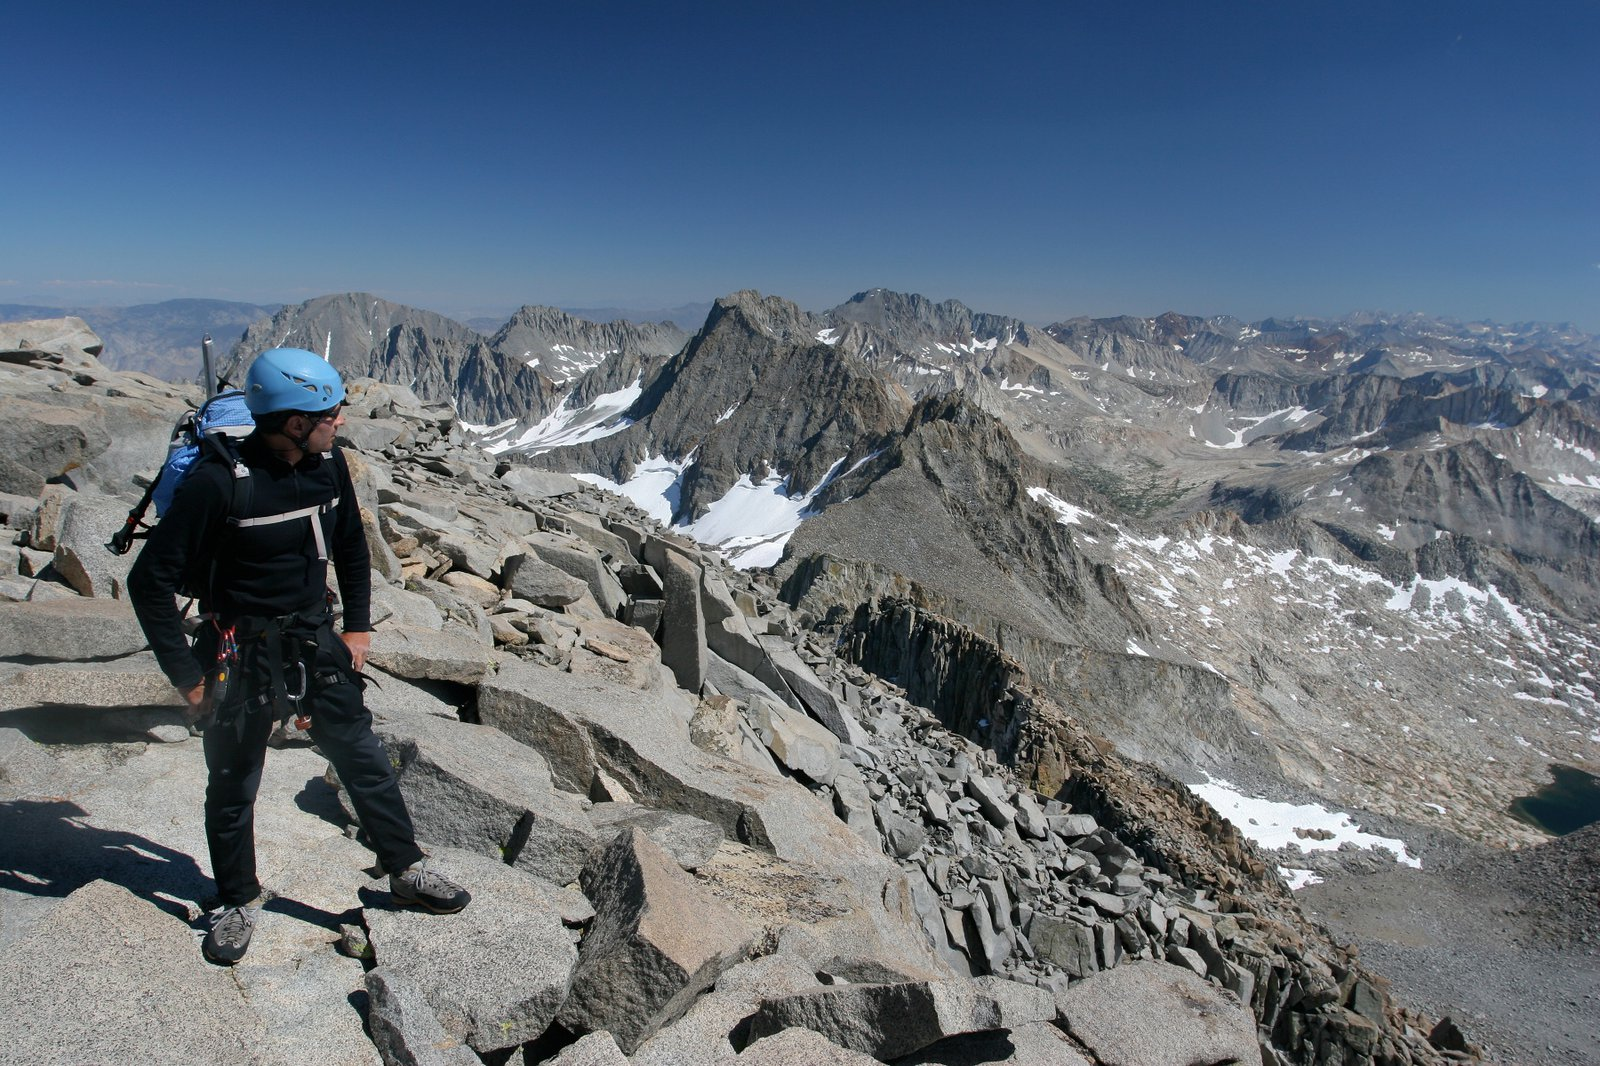 Michael Ybarra on Mt. Sill (photo: Misha Logvinov)